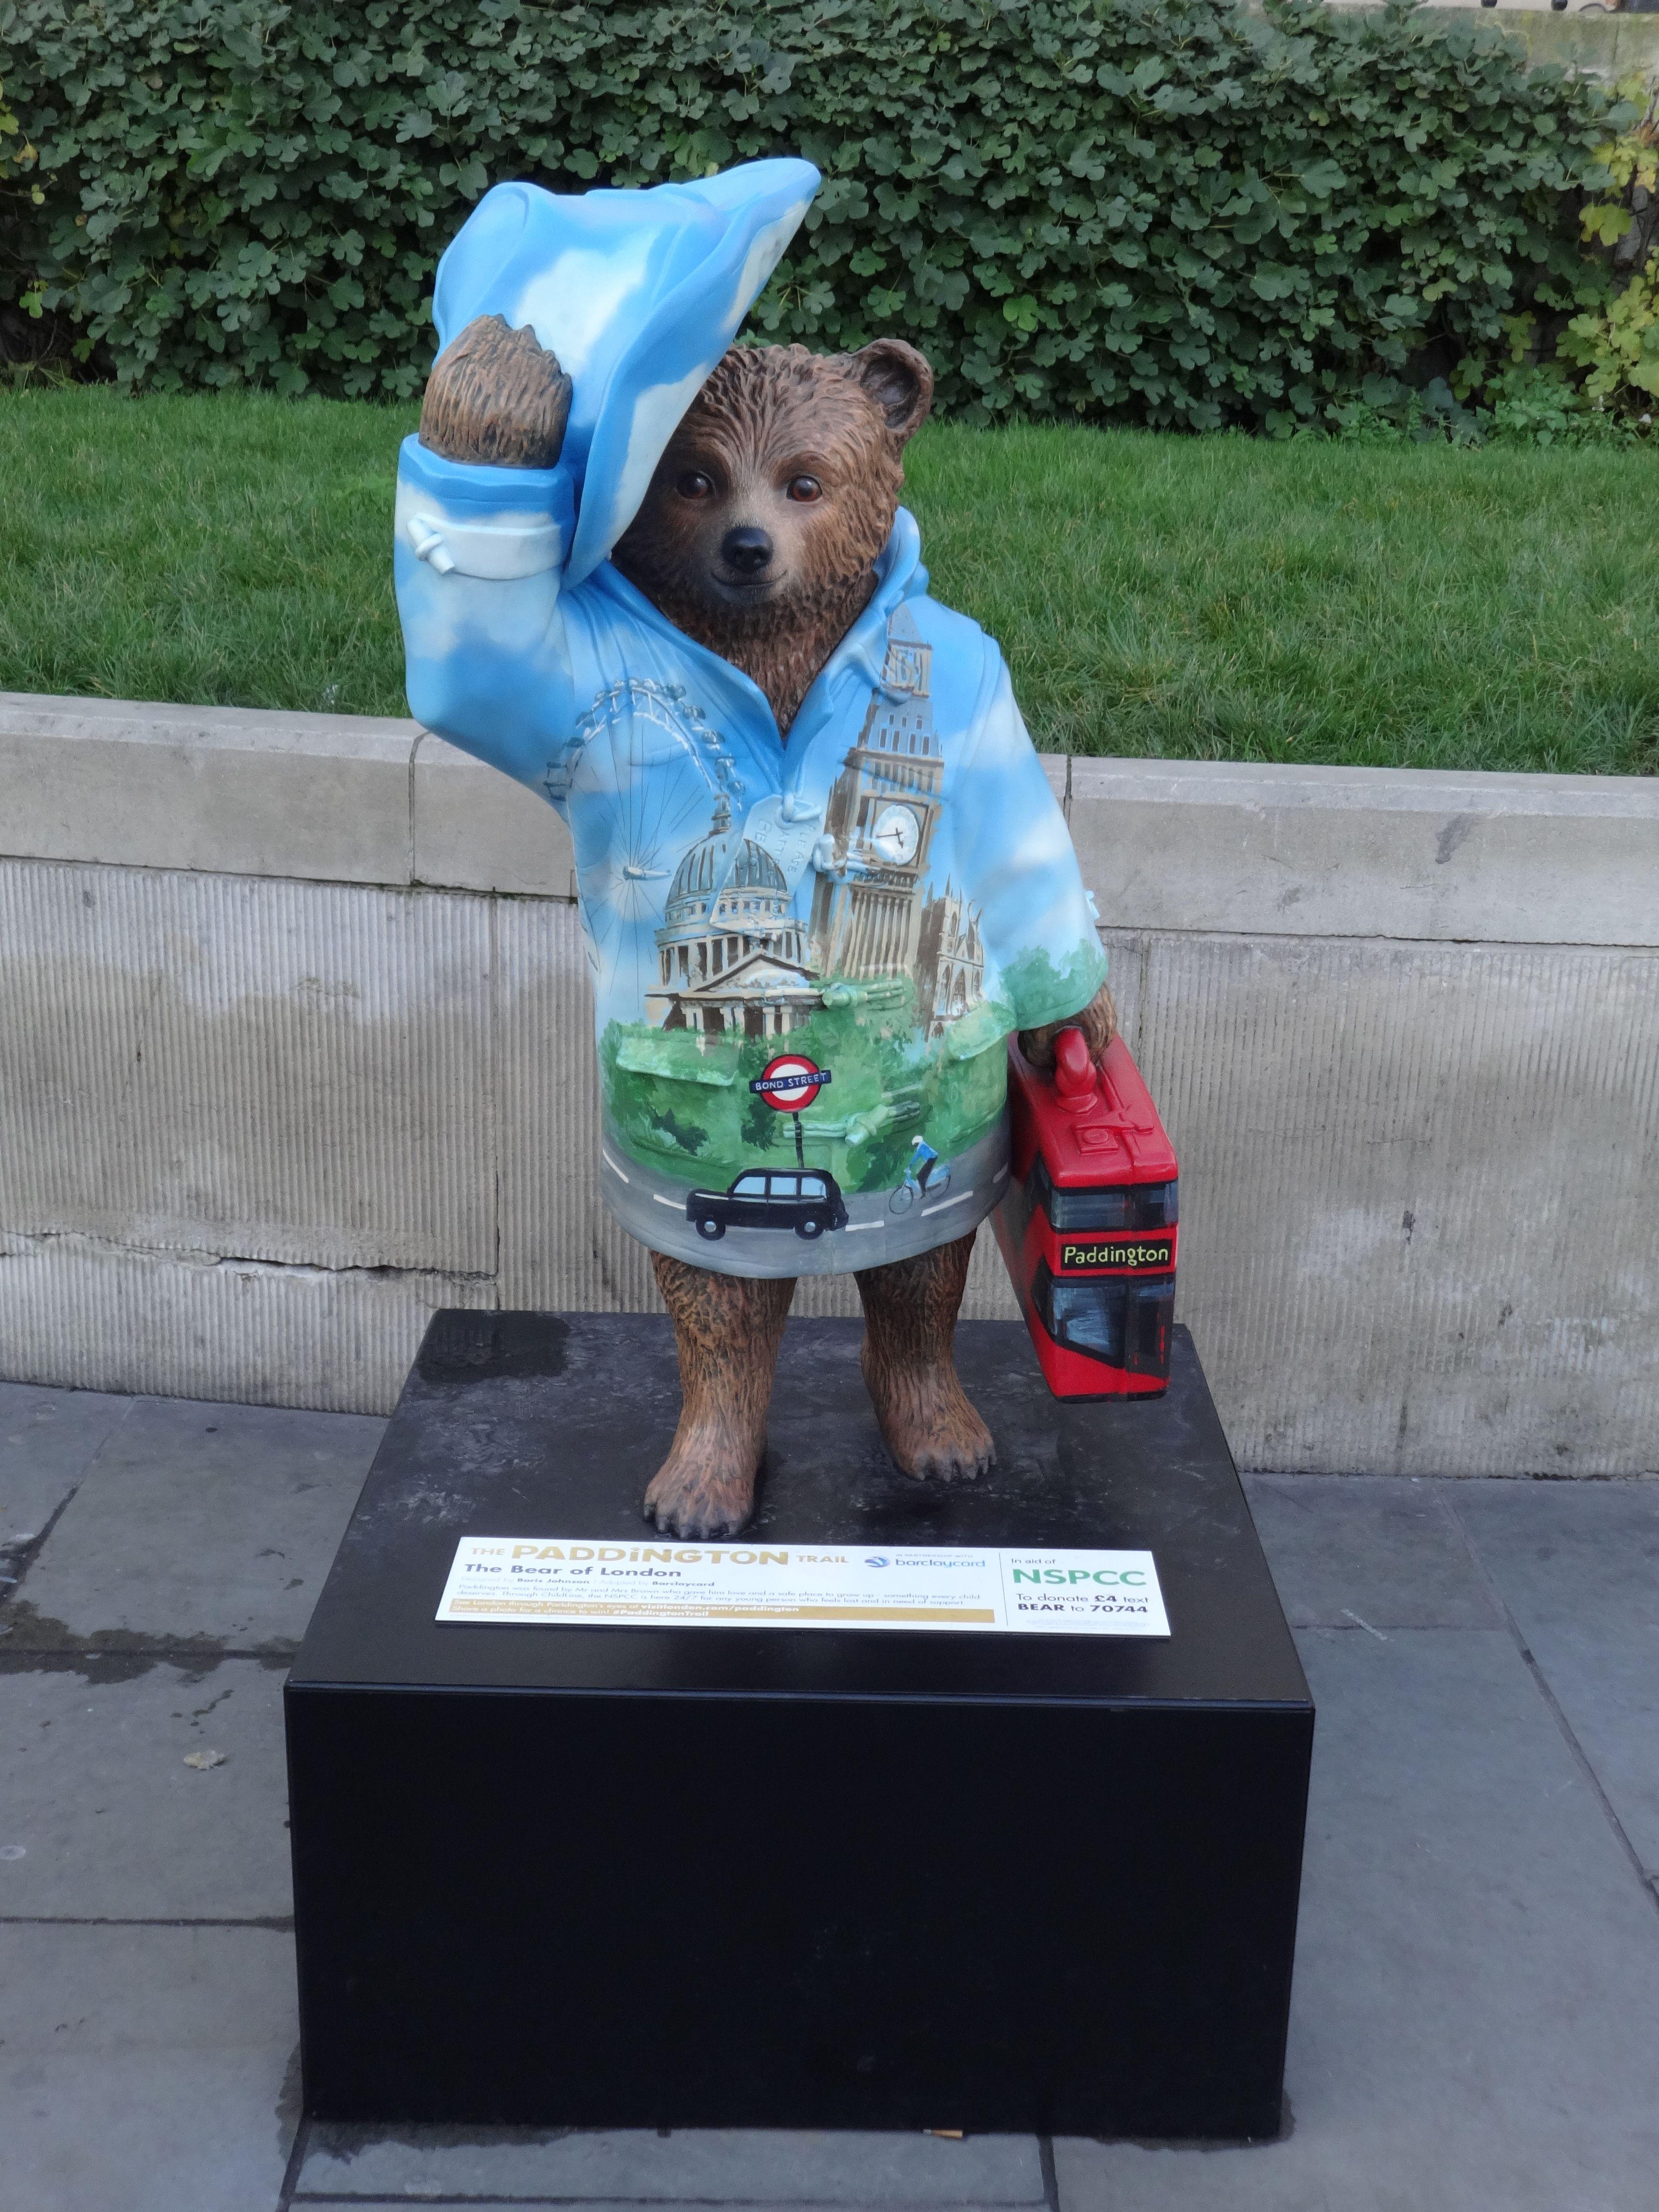 The Bear of London, Trafalgar Square Paddington